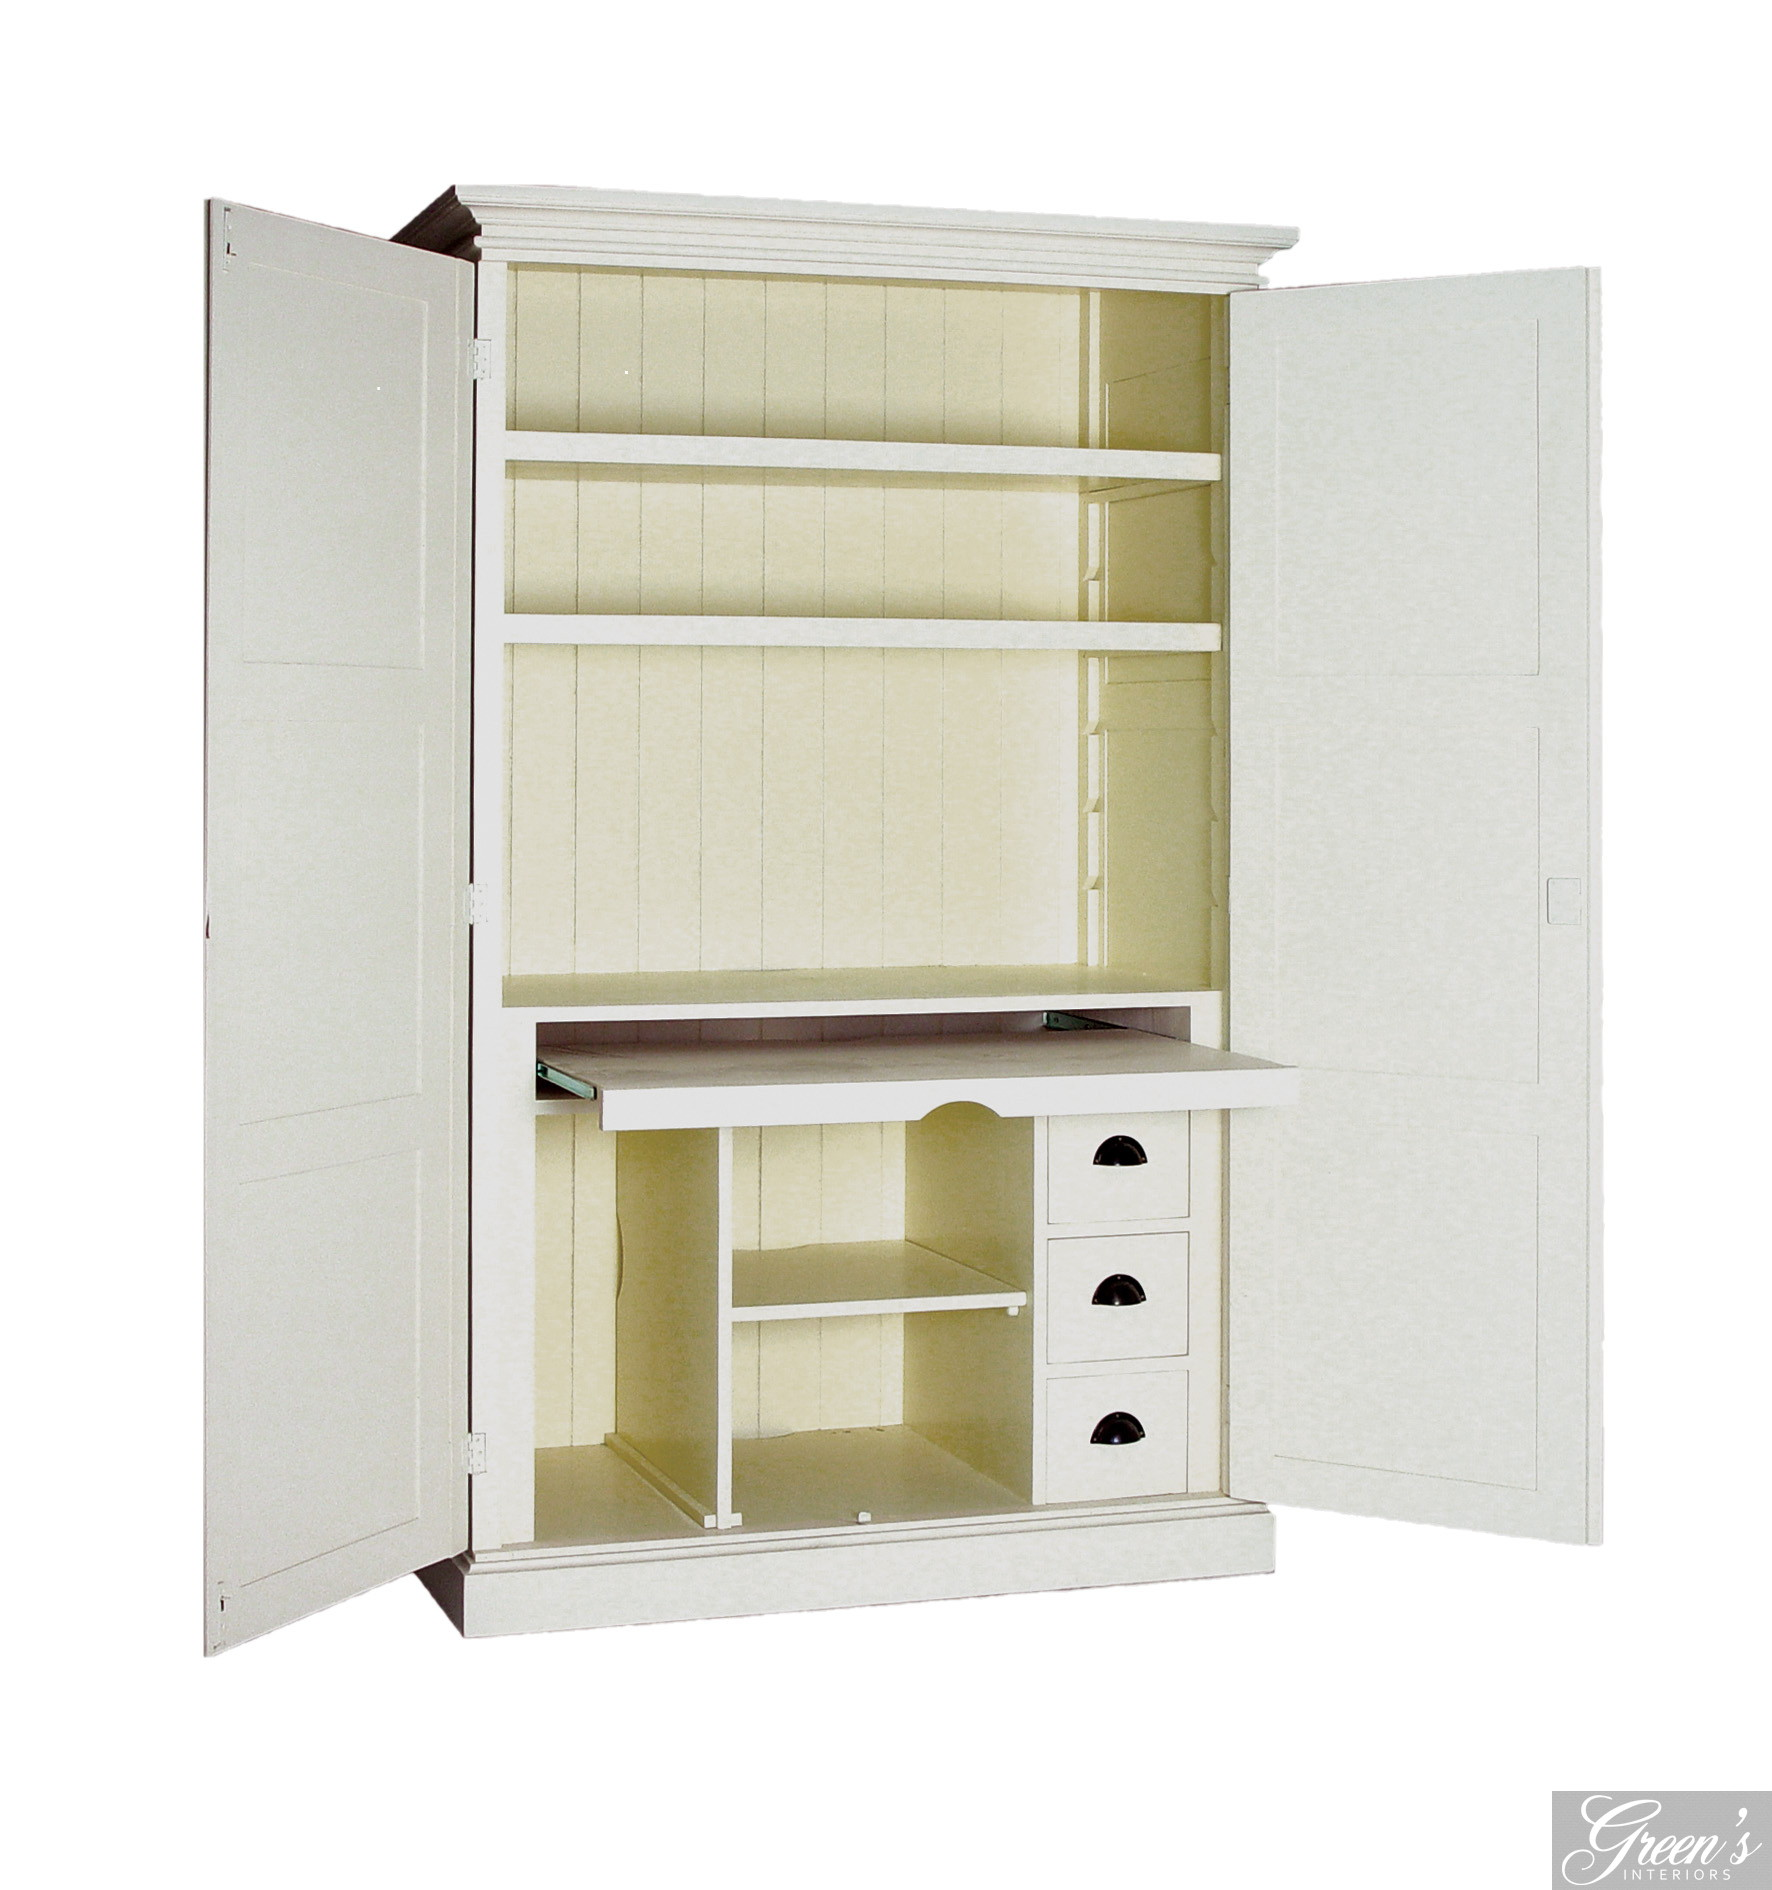 PC-Schrank, Landhaus, Houston, Kiefer farbig - DAM 10 Ltd. & Co KG